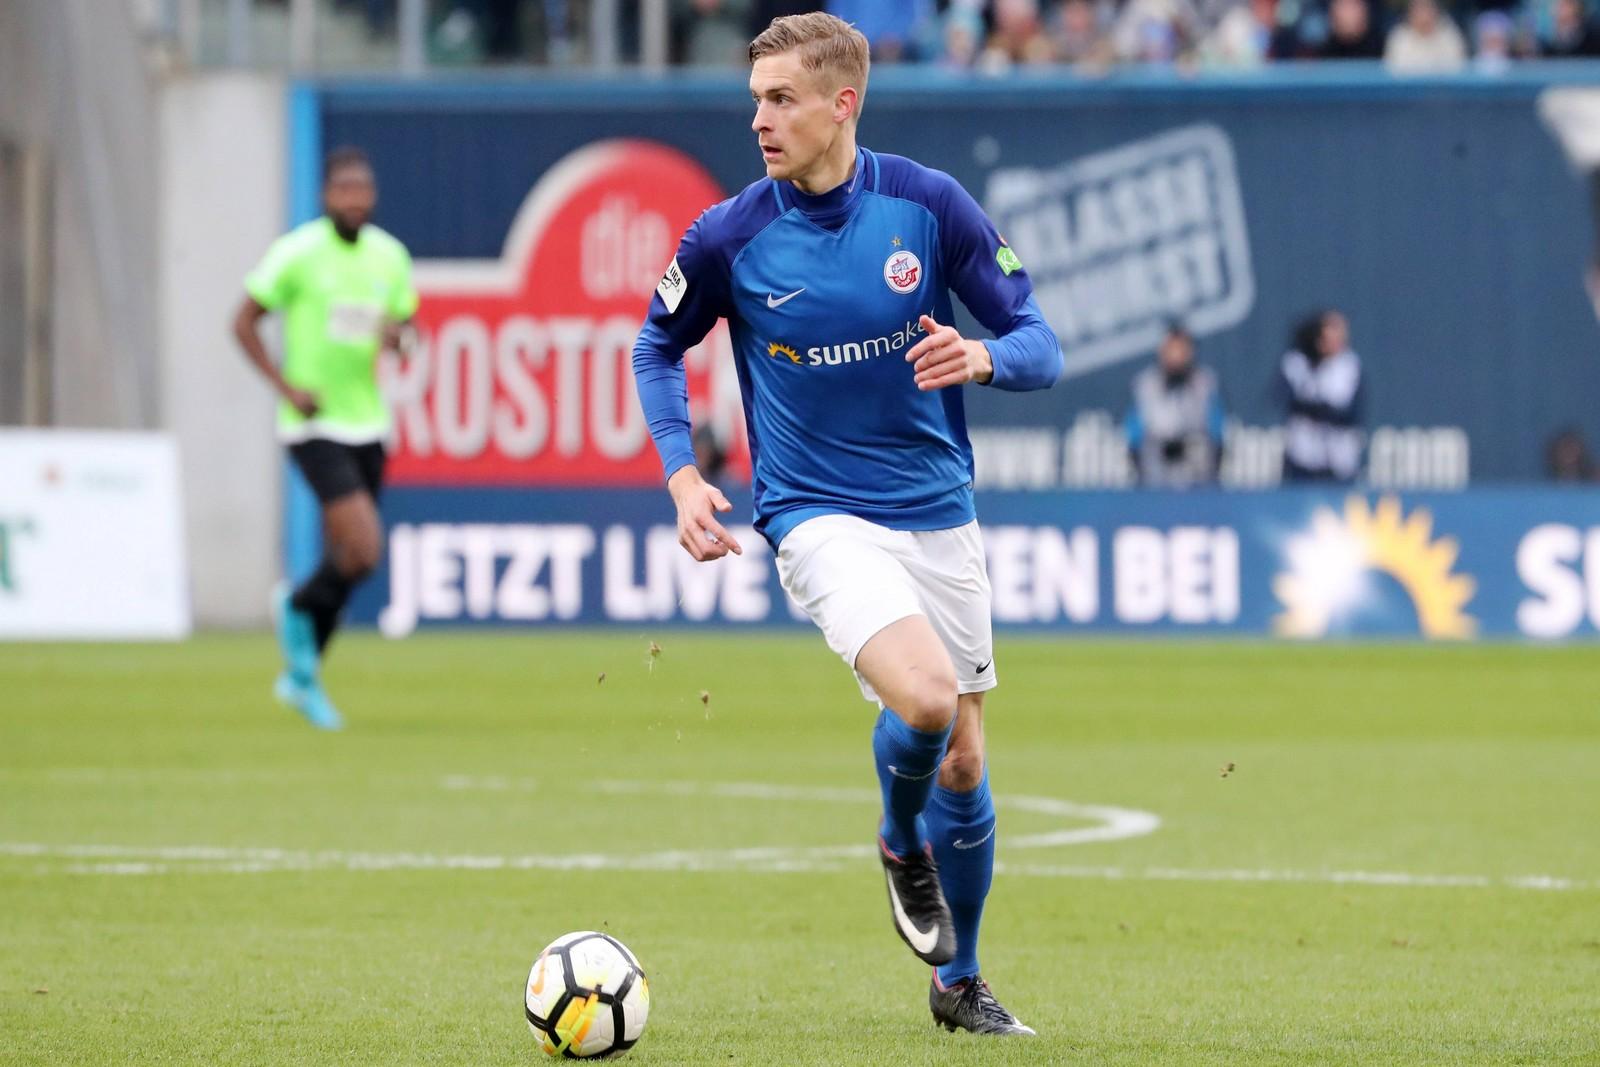 Oliver Hüsing am Ball für Hansa Rostock.